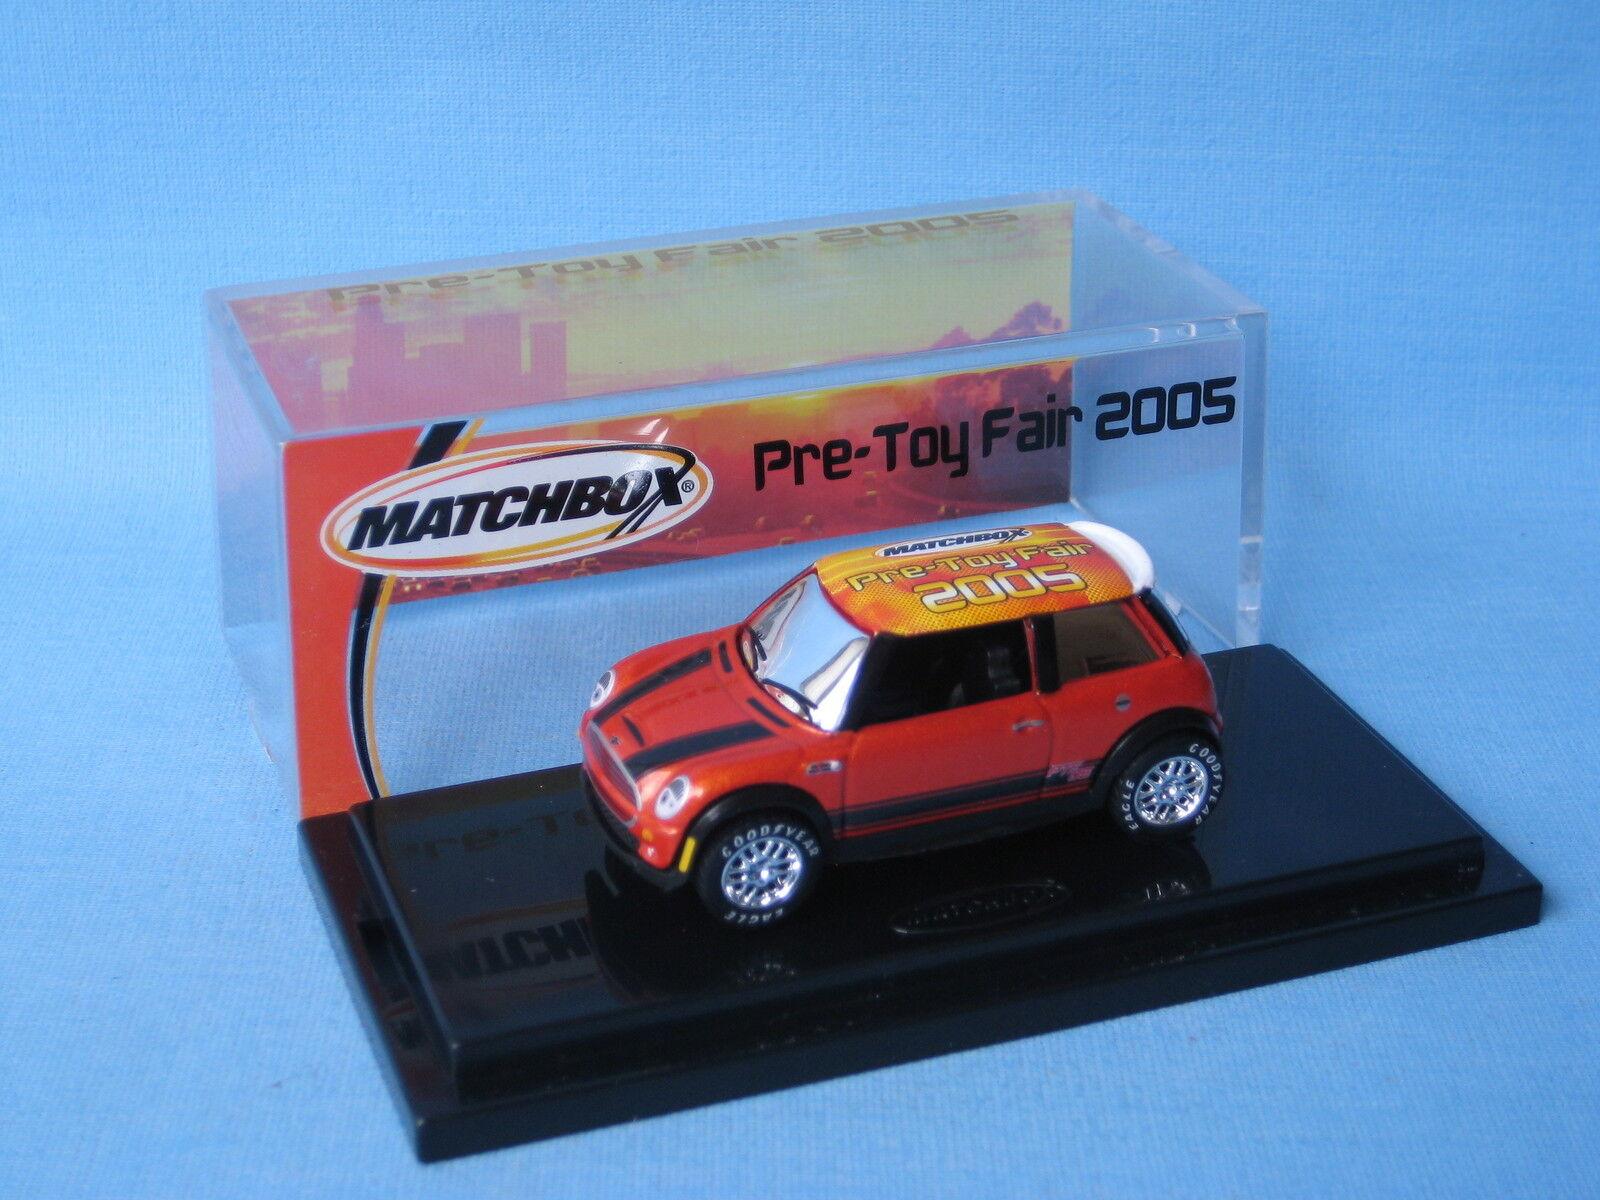 Matchbox Mini Cooper Cooper Cooper Pre-Toy Fair 2005 Display Boxed Toy Model 60mm ef1022